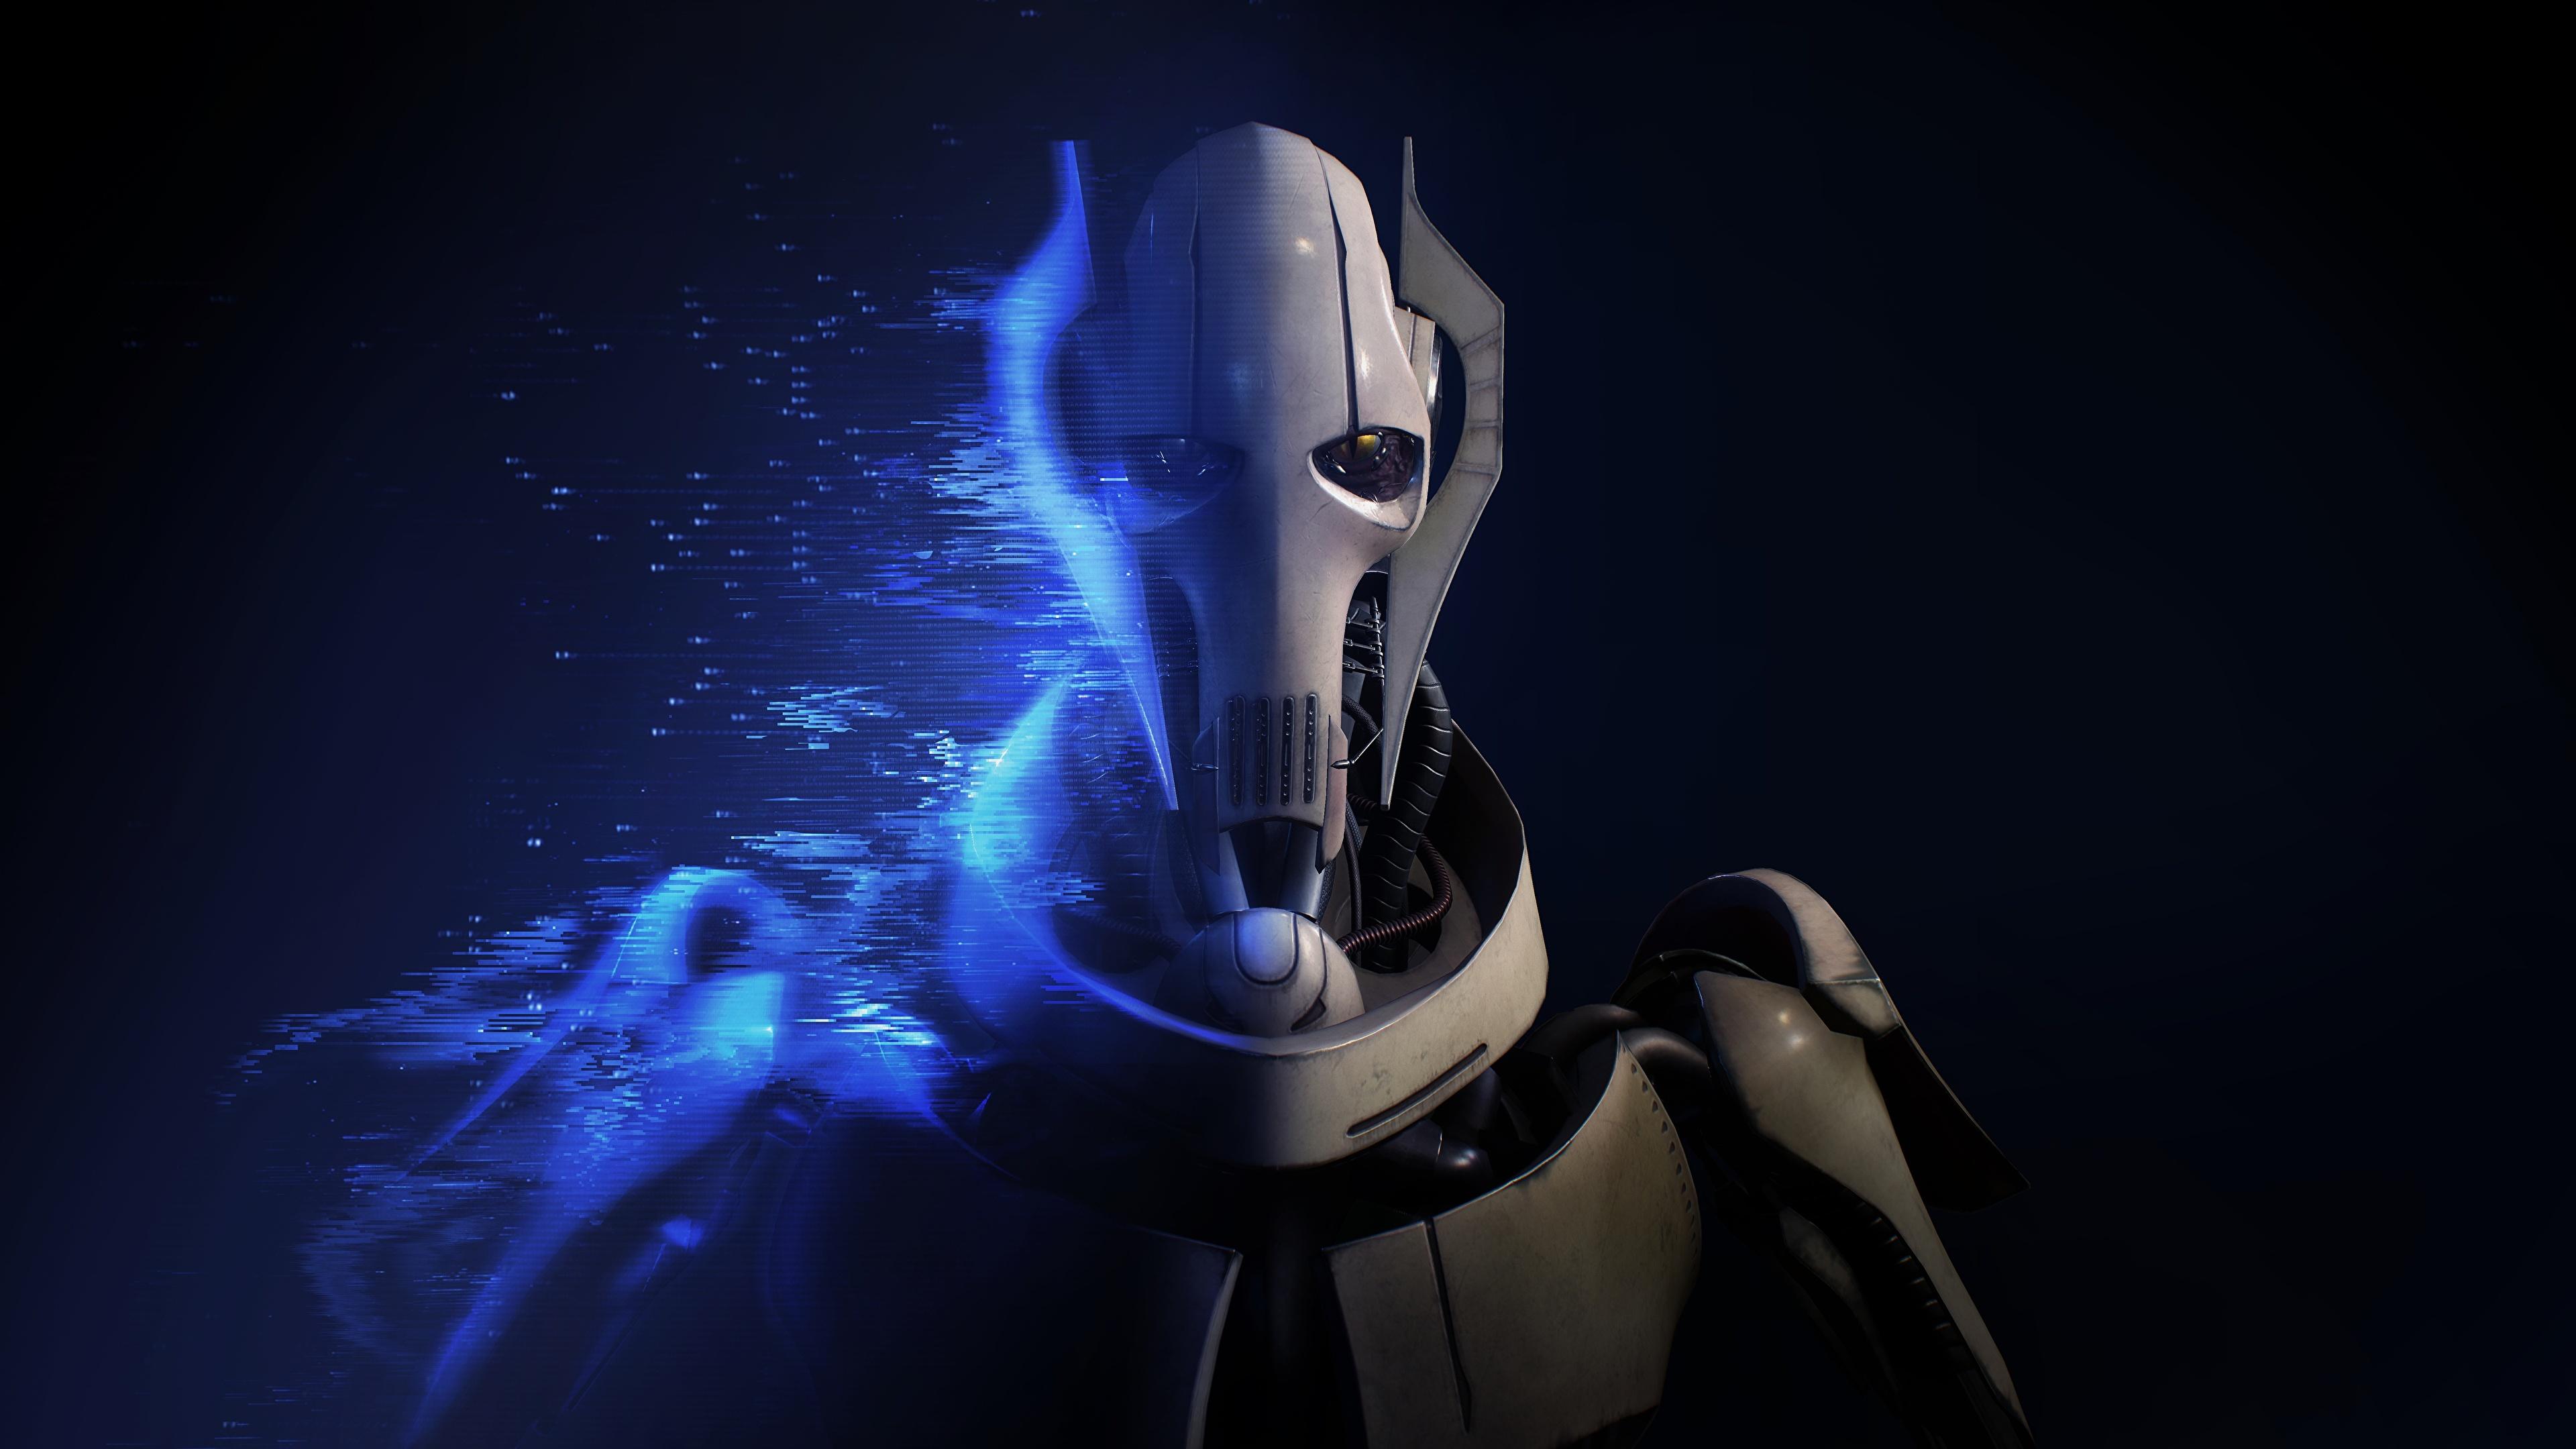 Photo Star Wars Battlefront Ii 2017 Clone Trooper 3840x2160